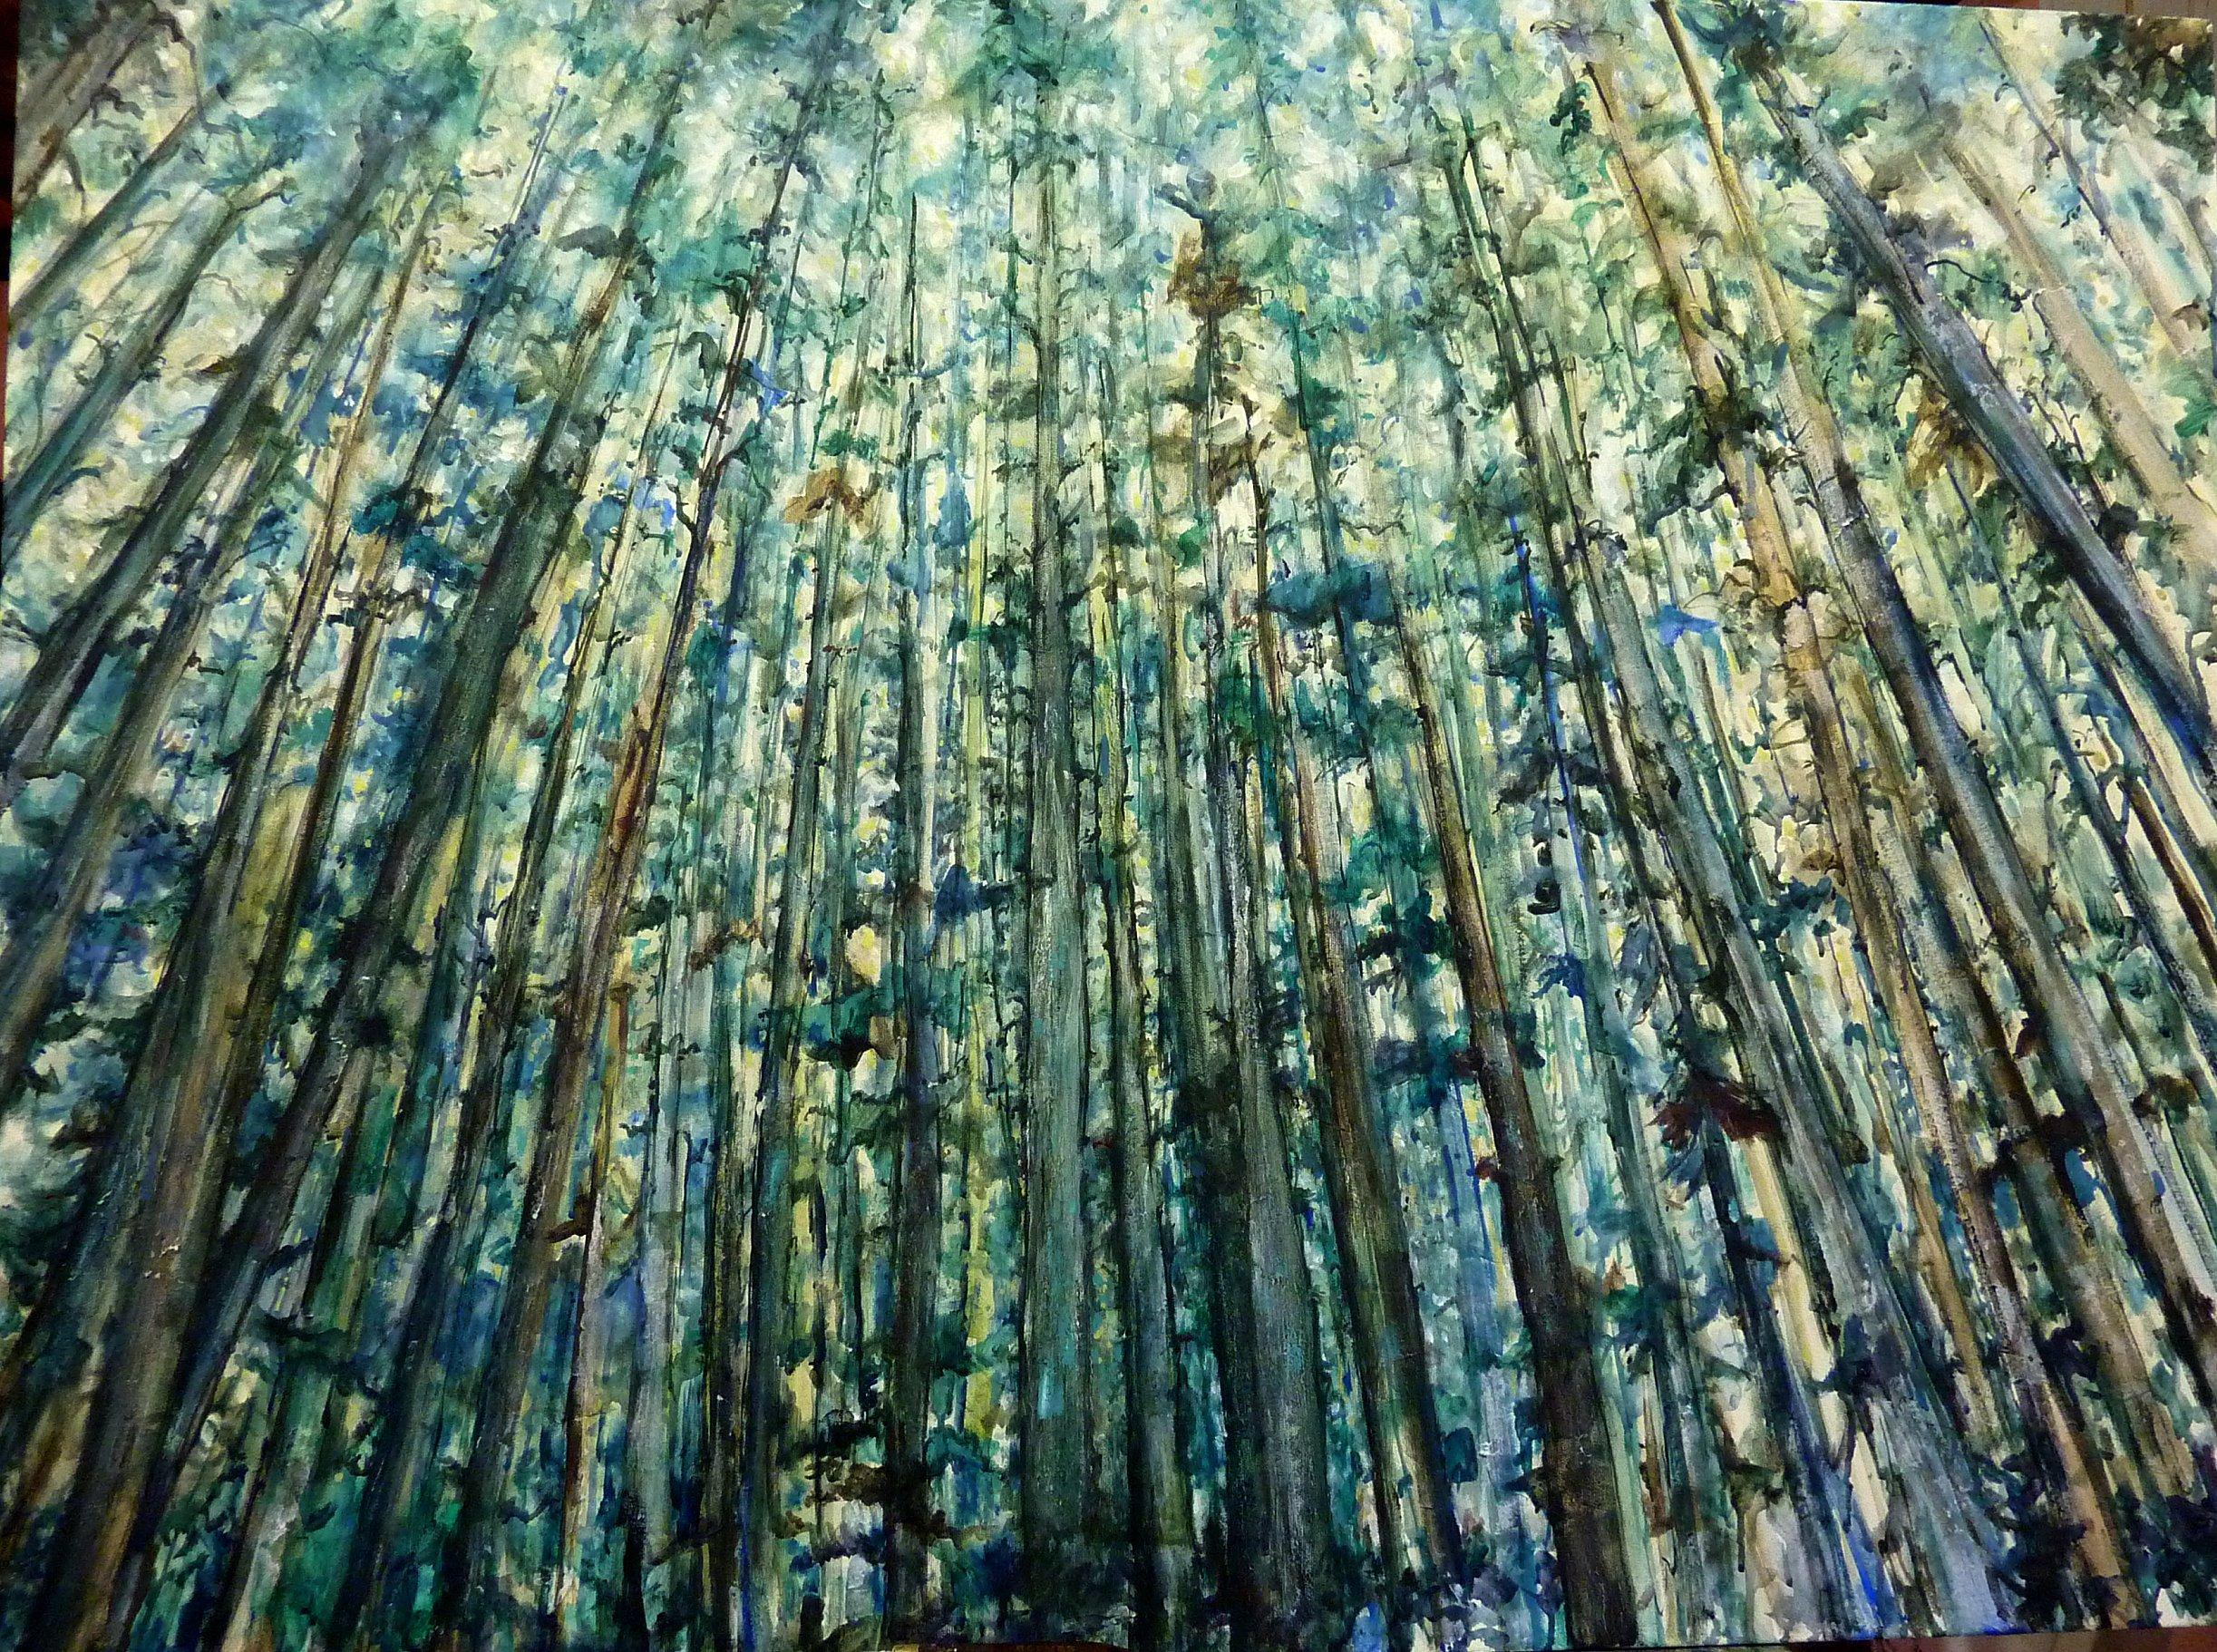 The Trees   Landscape Paintings   Kim Pollard   Canadian Artist   British Columbia   West Coast   Rainforest